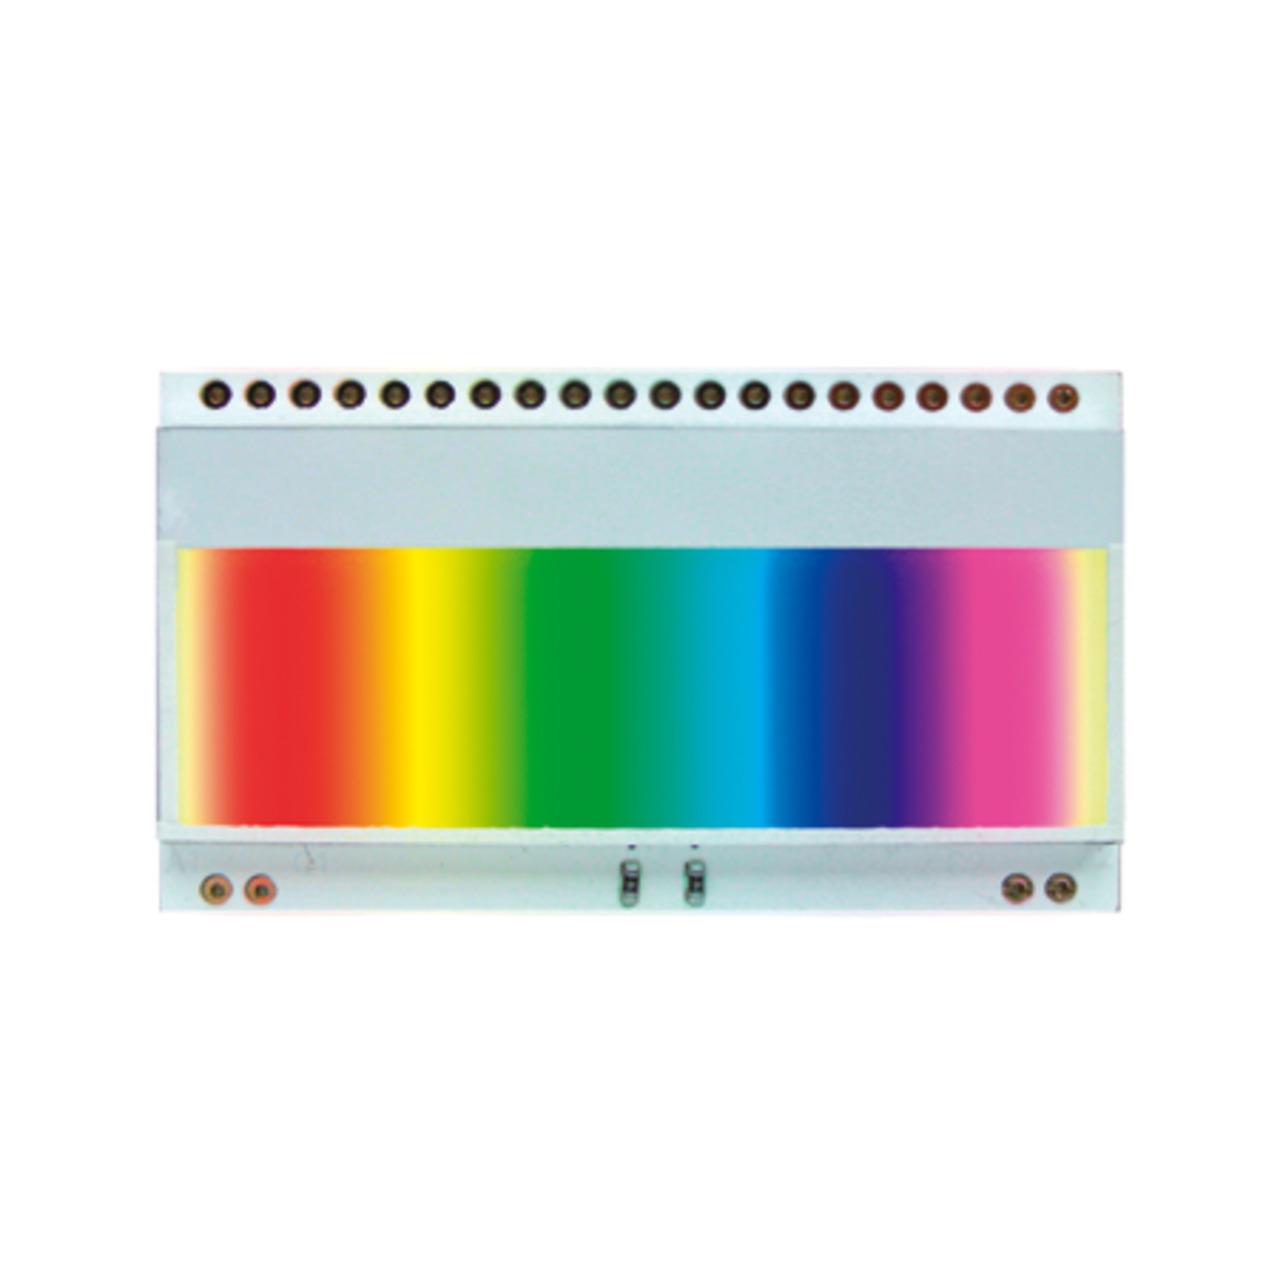 LED-Hintergrundbeleuchtungen- RGB-Fullcolor